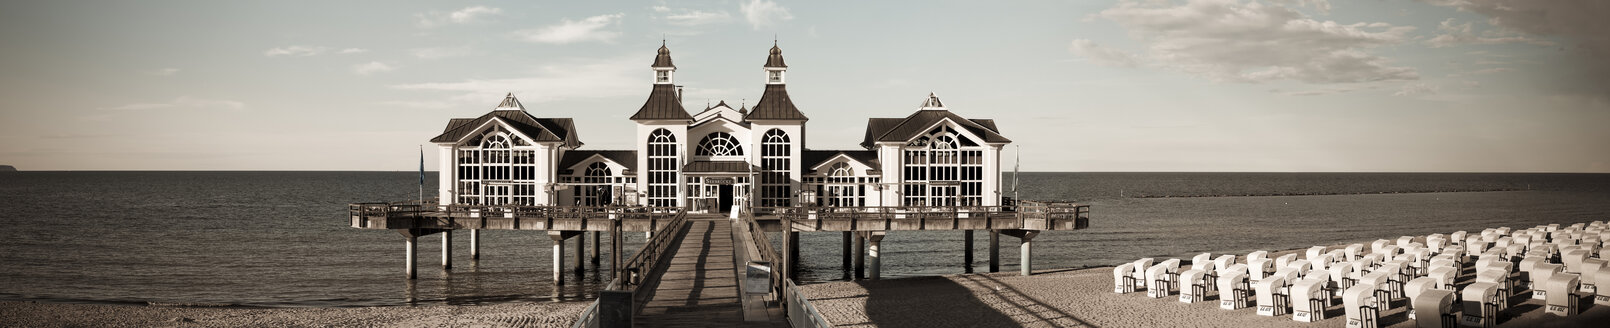 Germany, Mecklenburg-Western Pomerania, Ruegen, Sellin, view to sea bridge - MABF000296